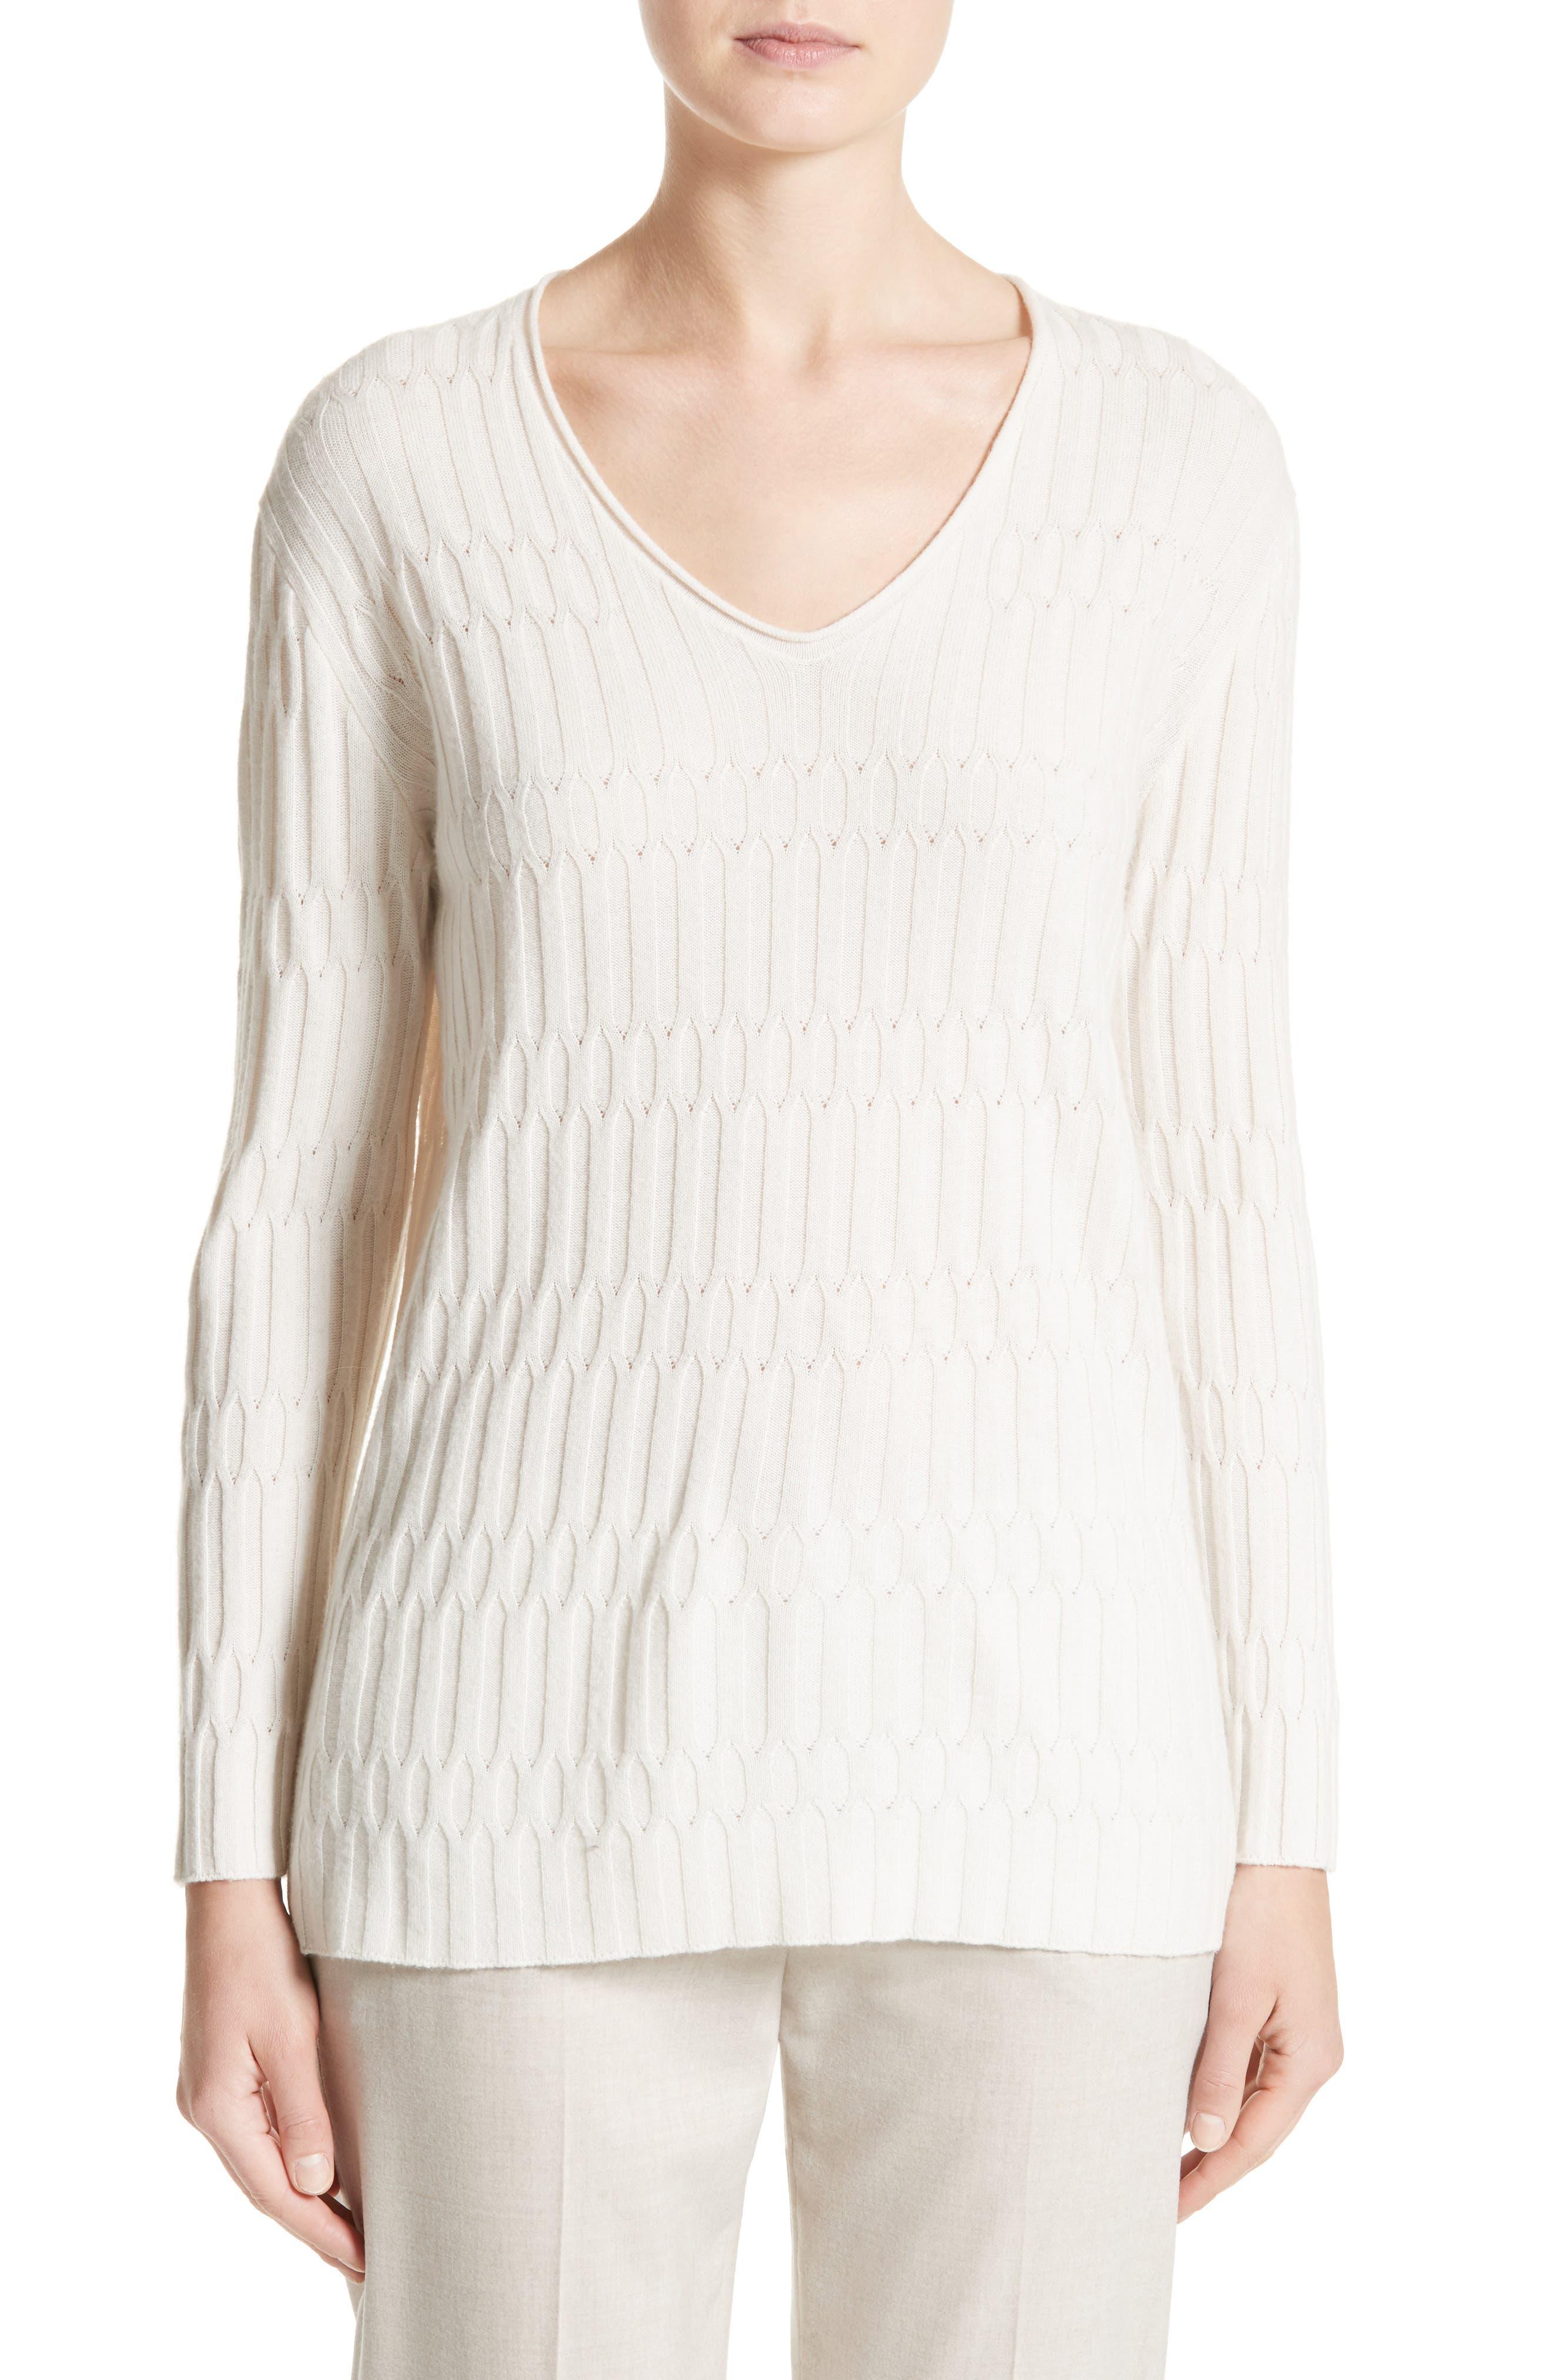 Fabiana Filippi Cashmere Column Knit Sweater